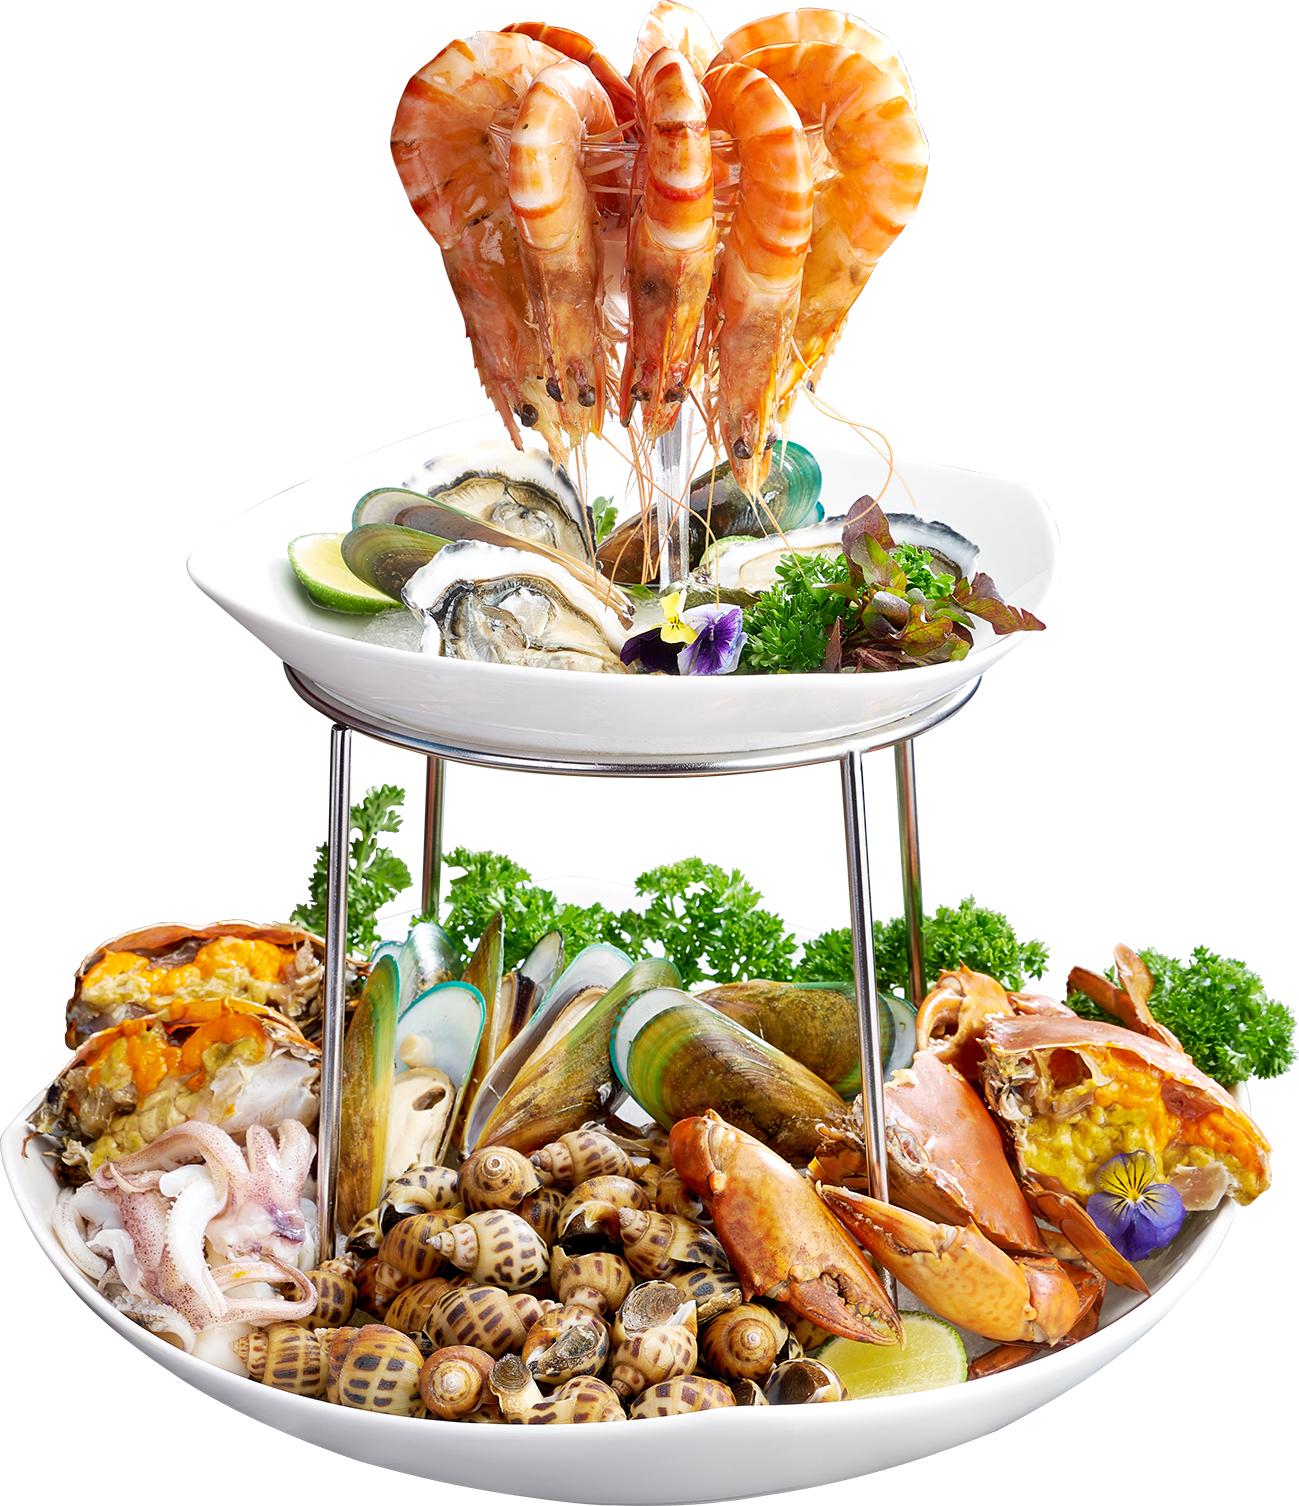 Cold seafood basket